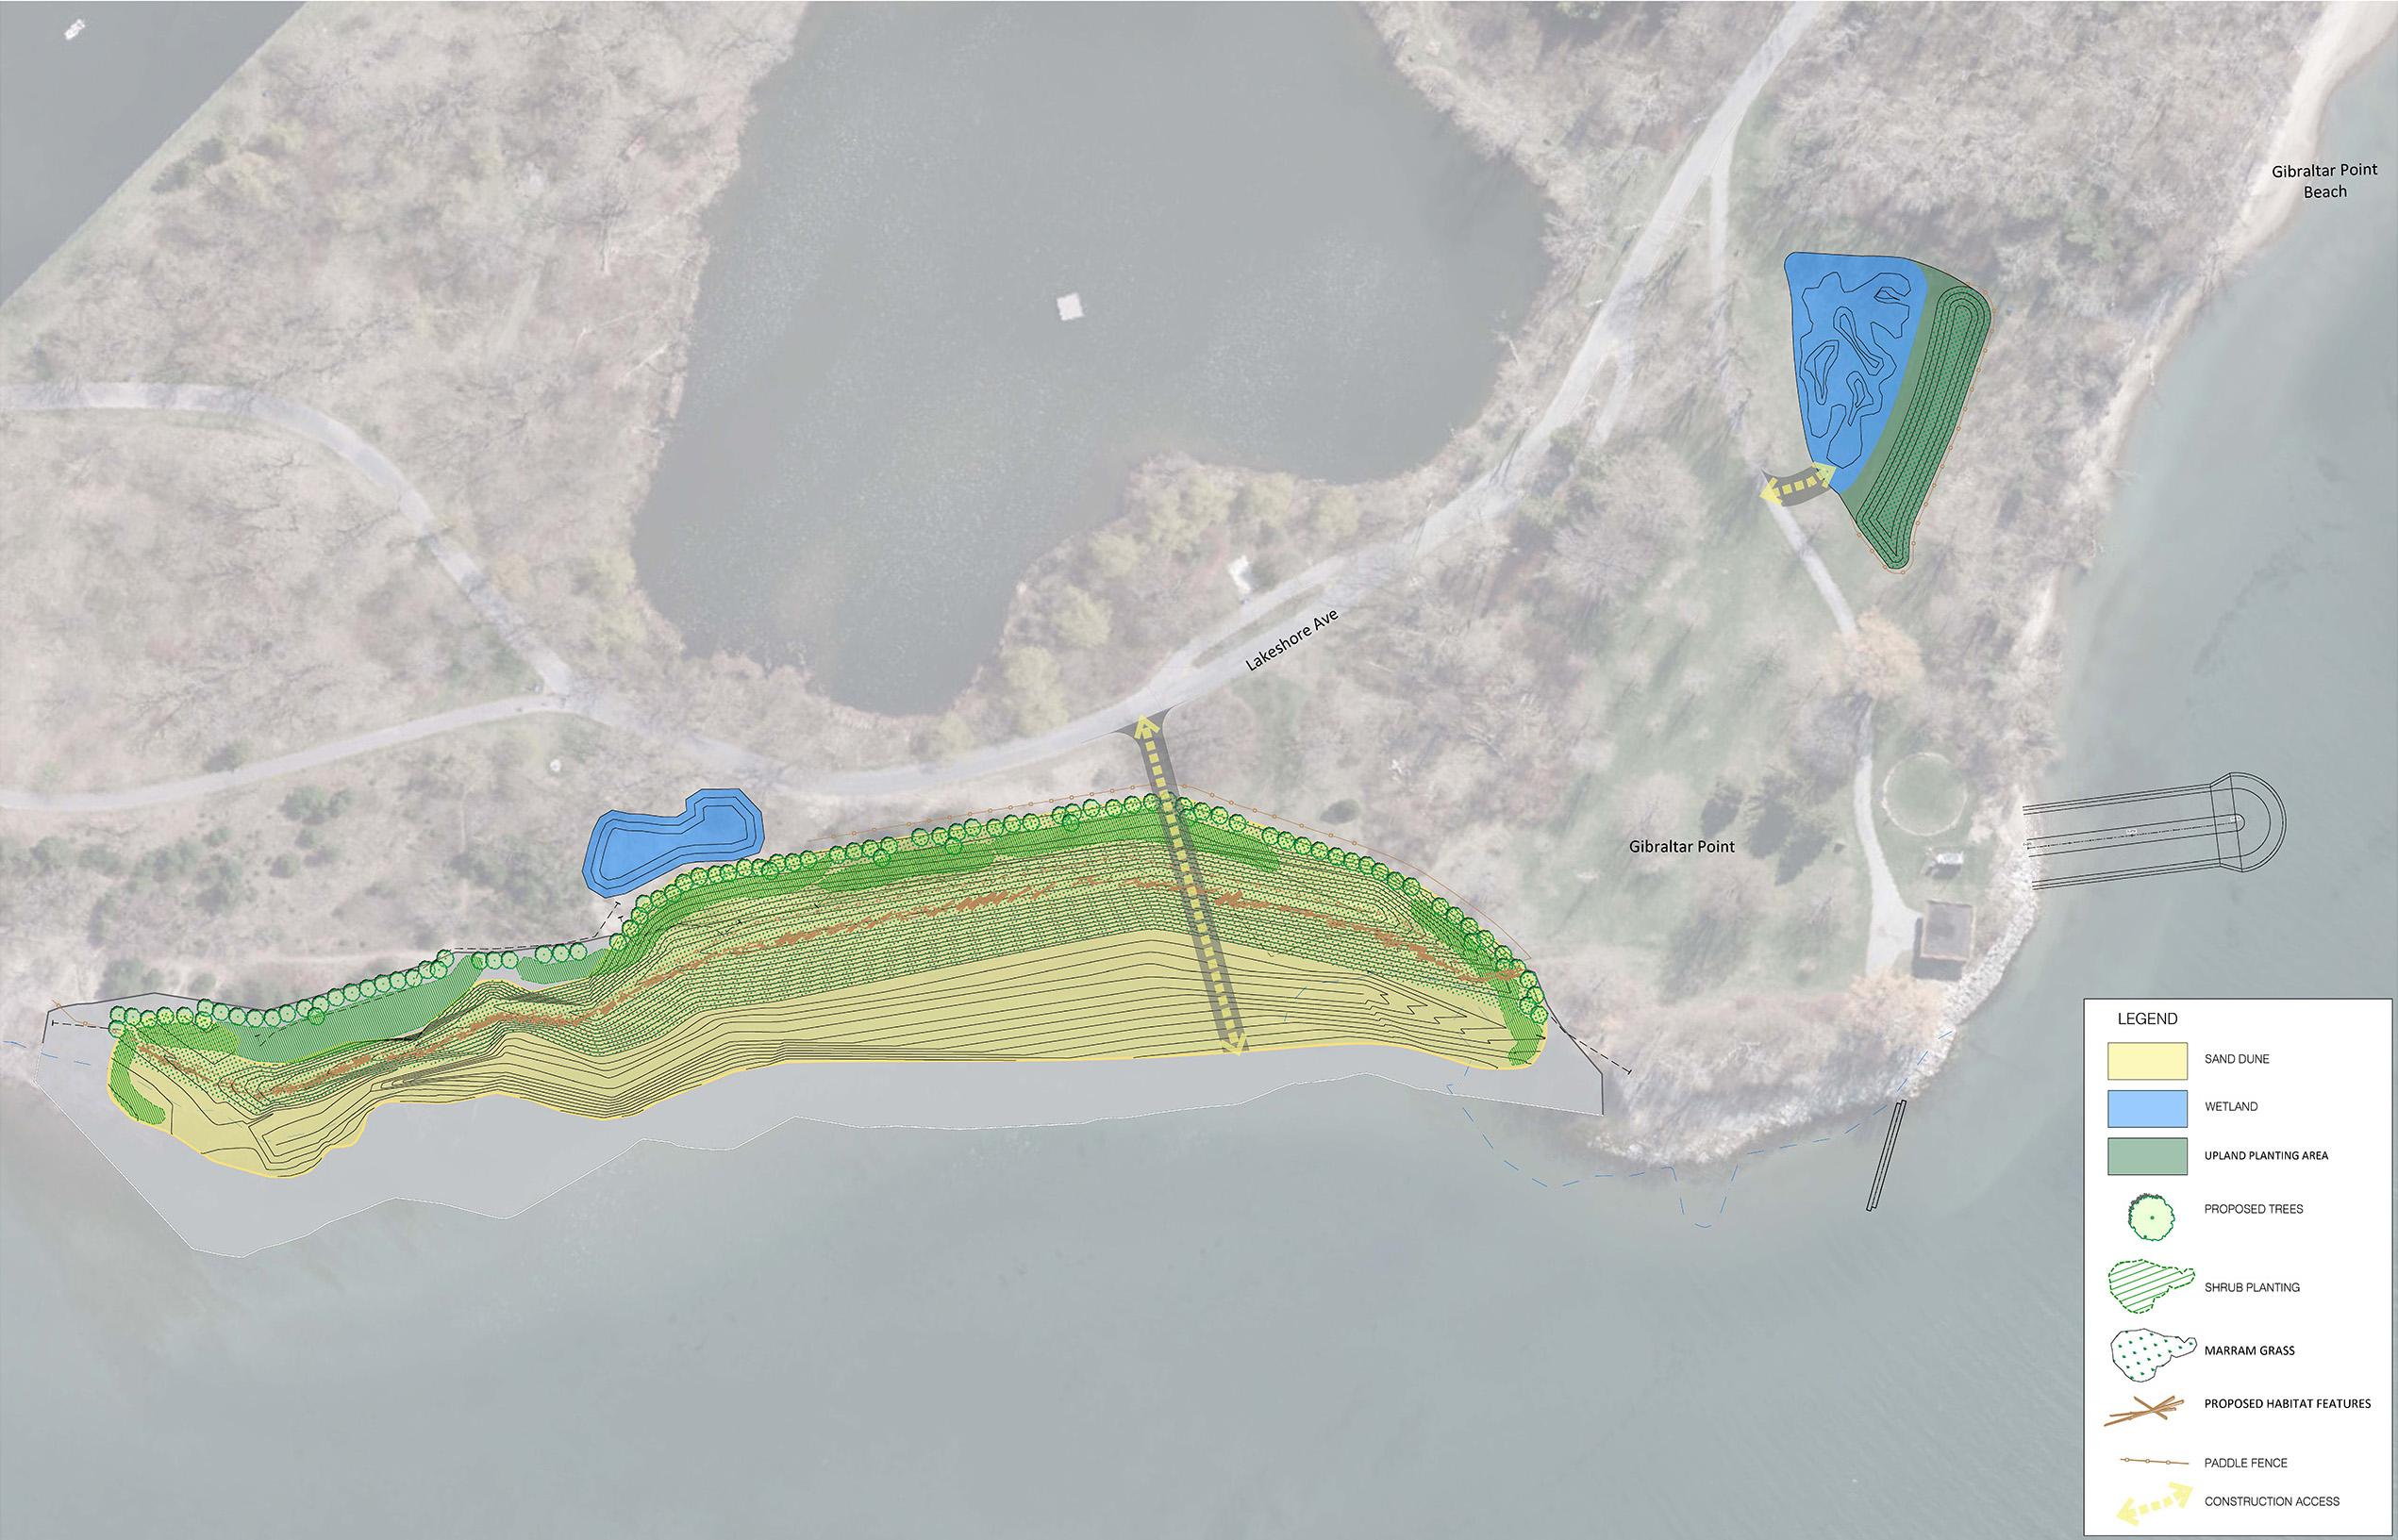 map depicting Gibraltar Point nearshore habitat plan